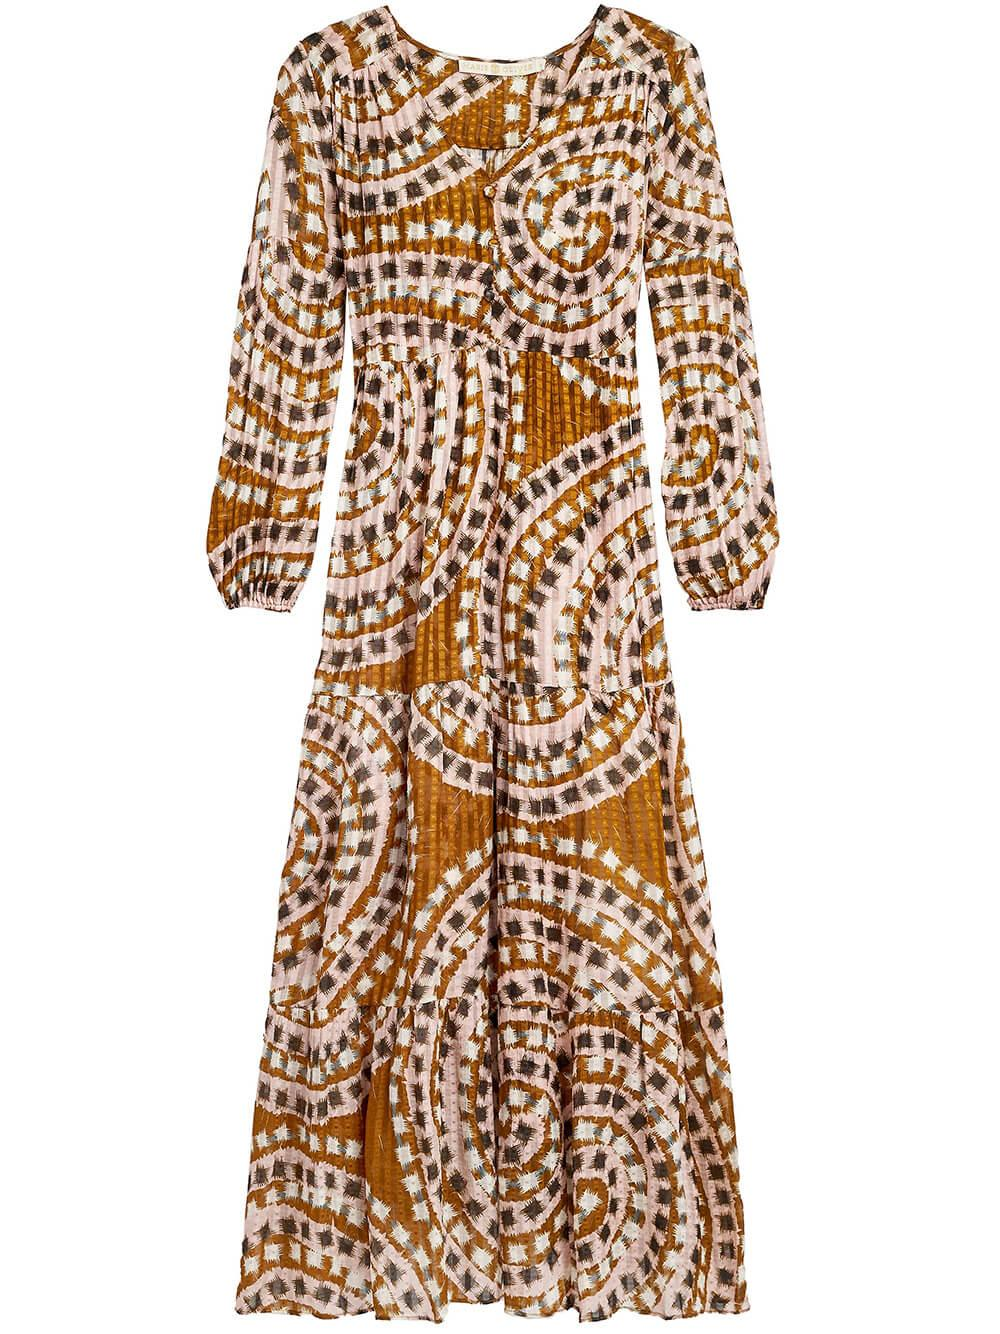 Luciana Maxi Dress Item # 2D3-130-244A